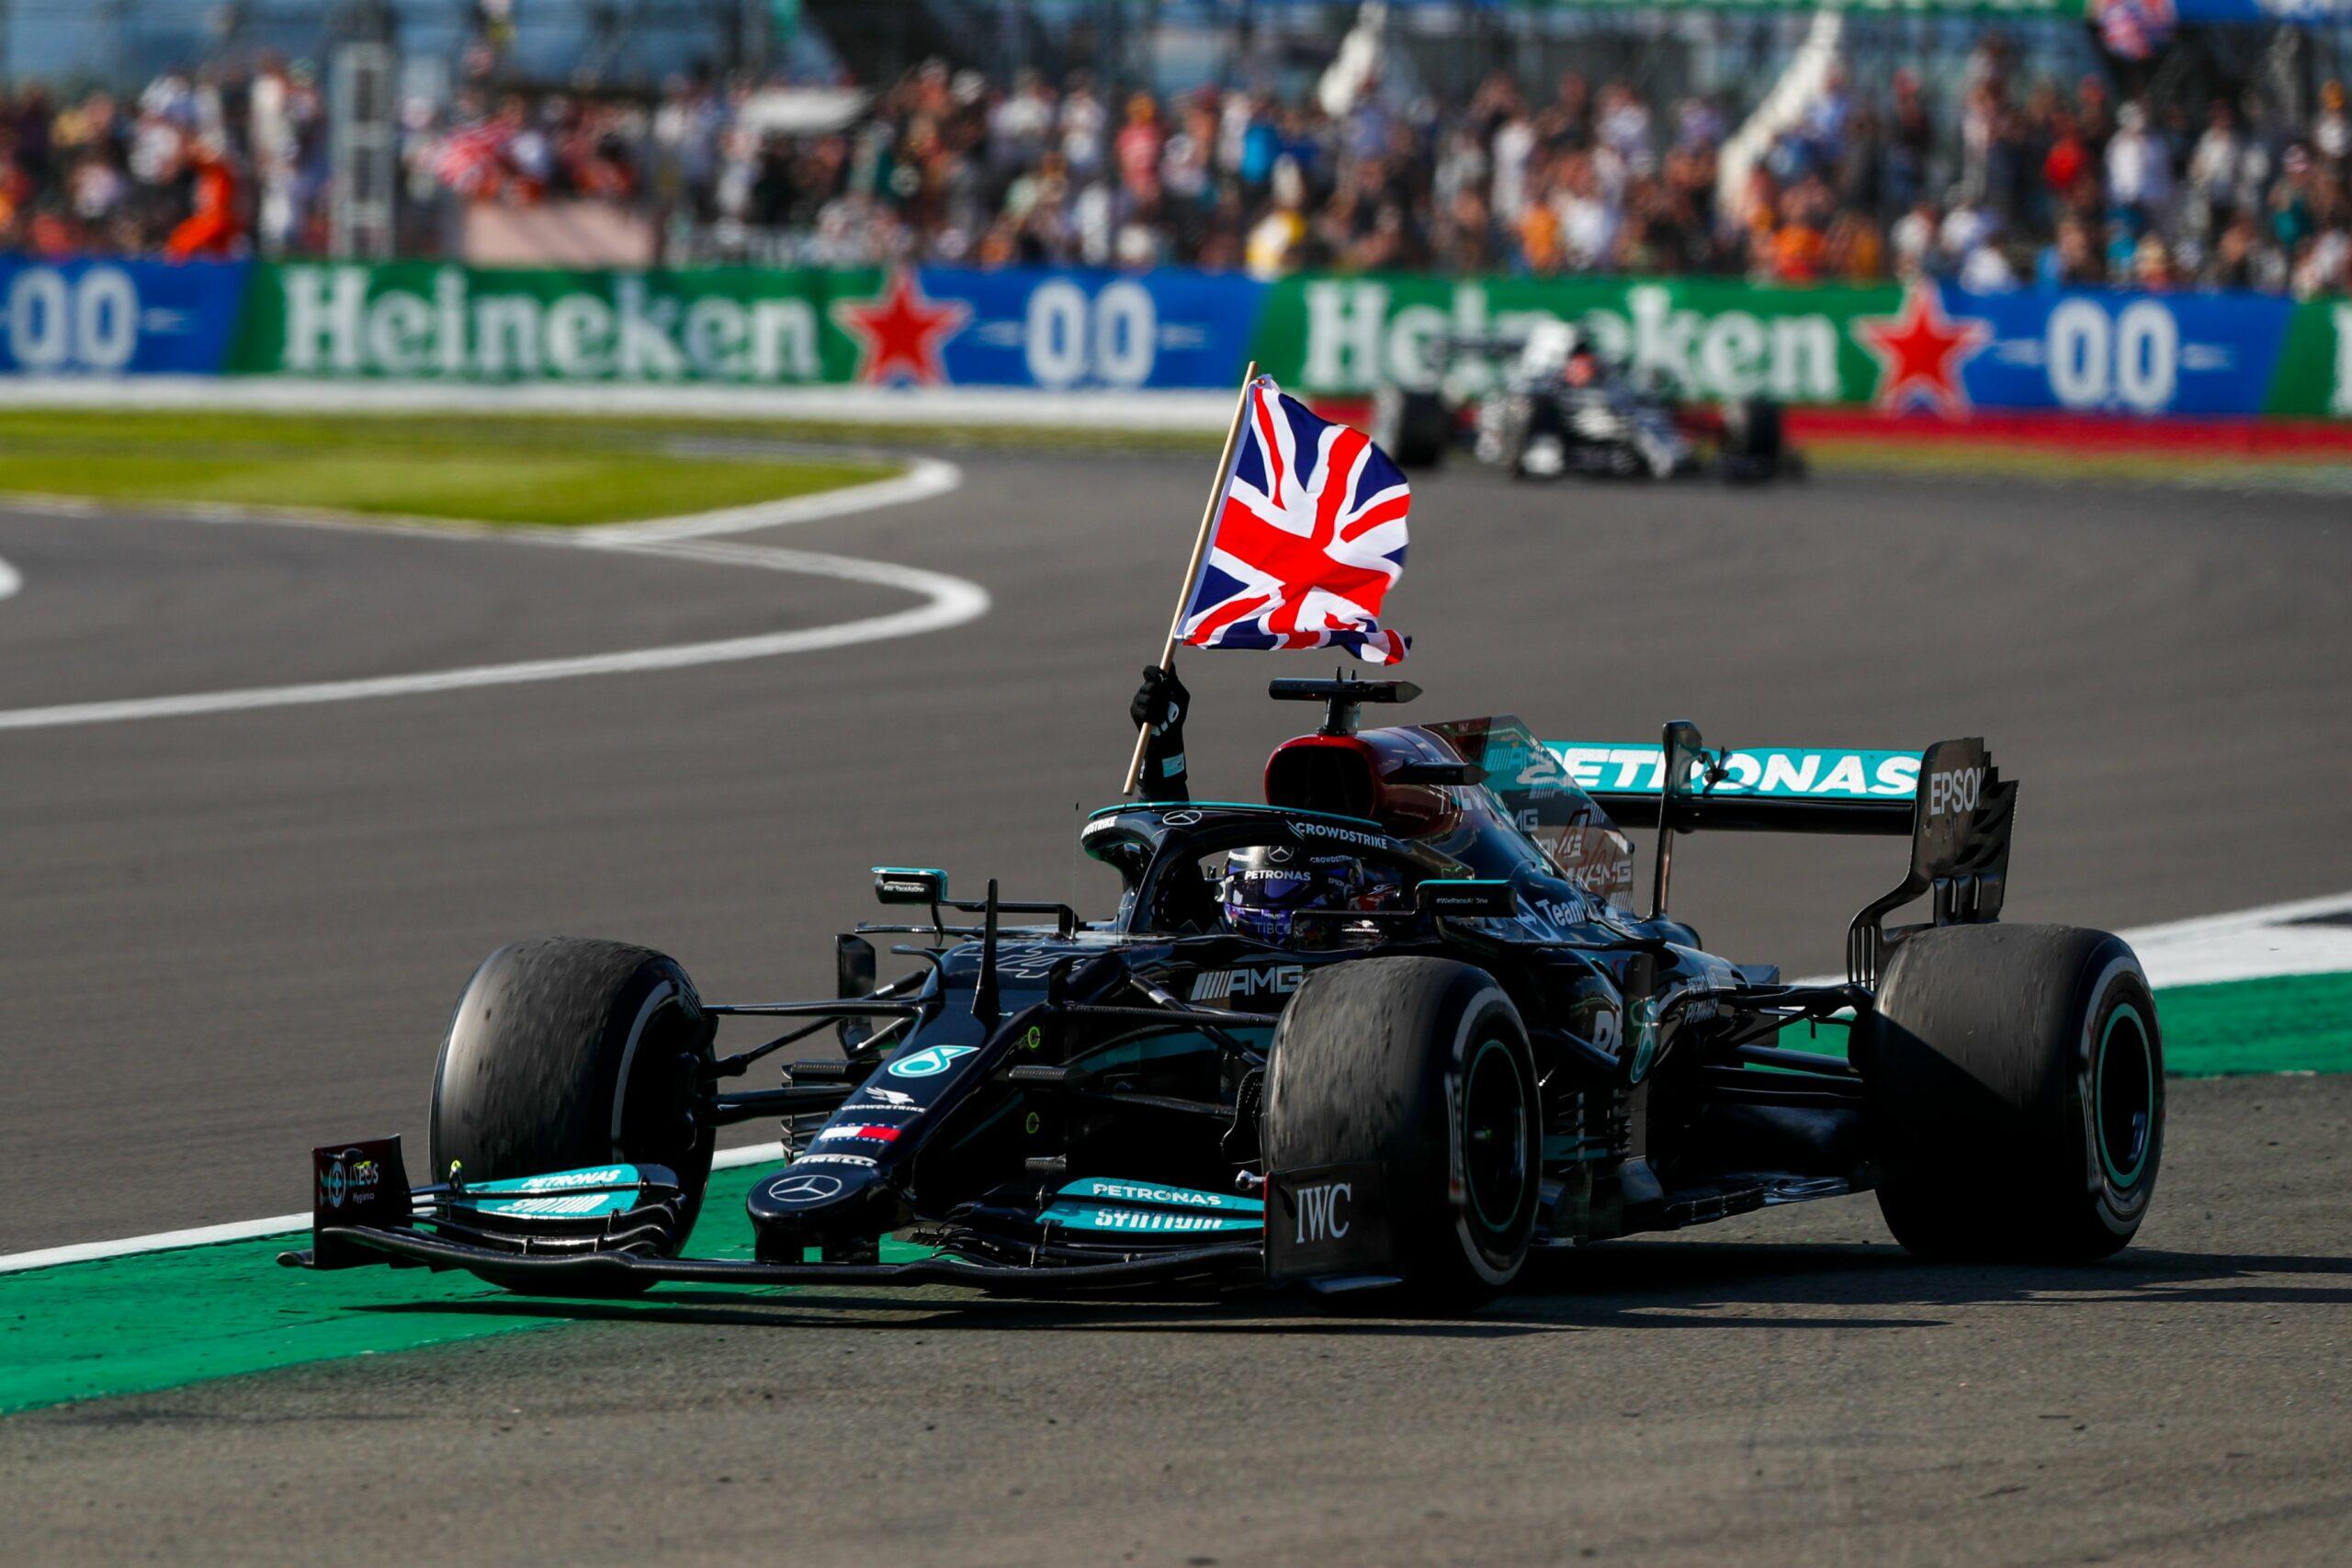 F1 - Hamilton met le feu à Silverstone, Verstappen perd gros